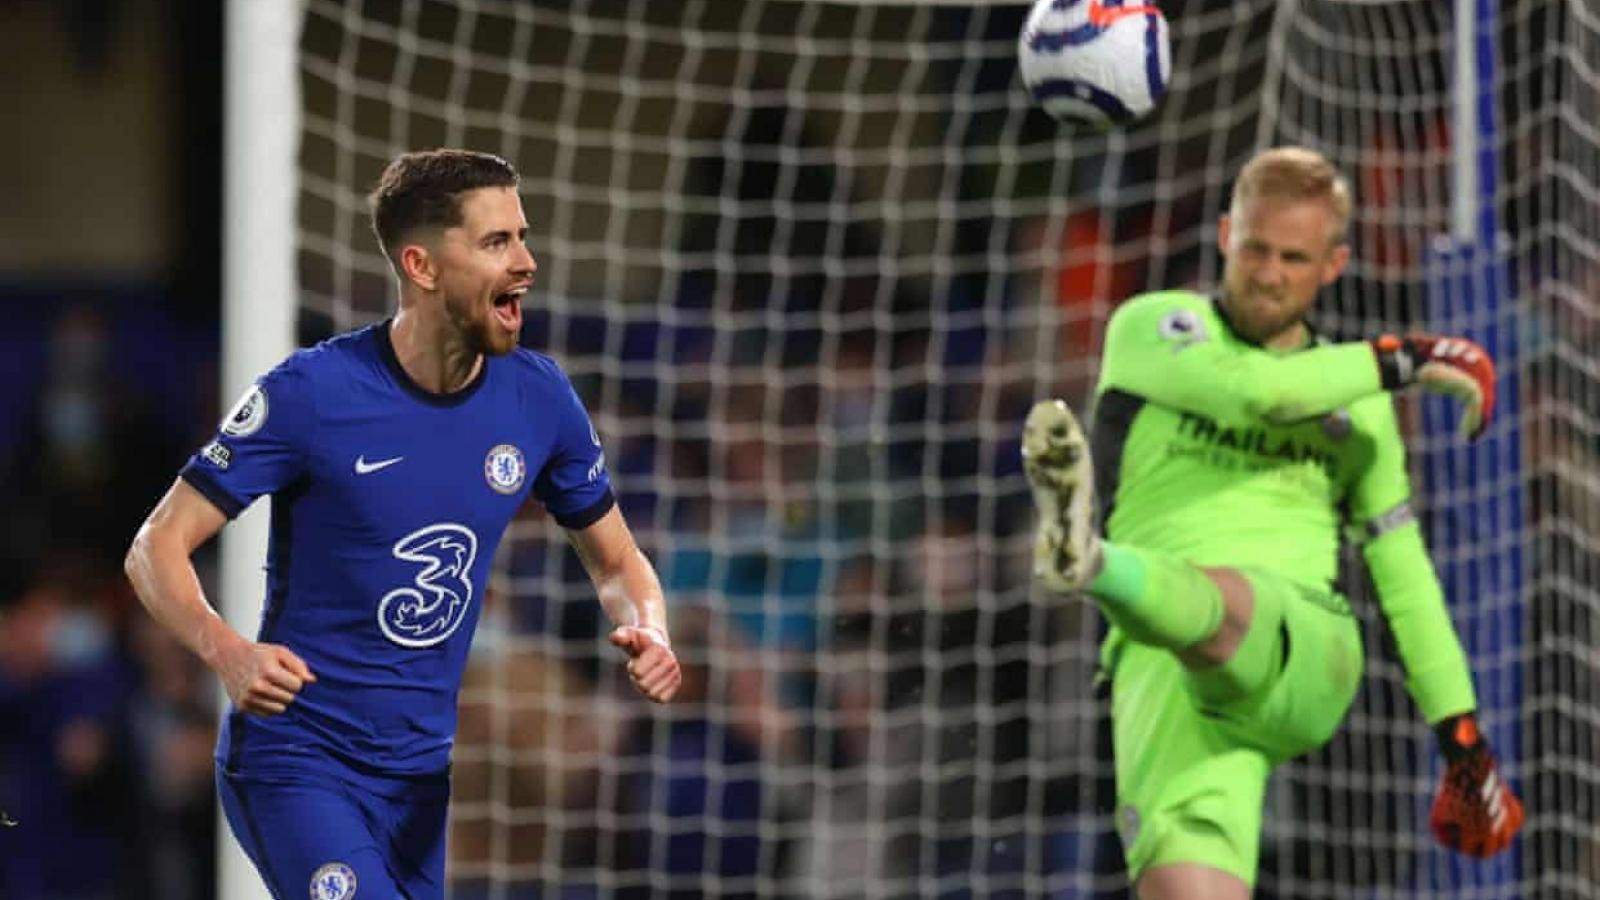 Hạ gục Leicester, Chelsea chạm 1 tay vào tấm vé dự Champions League